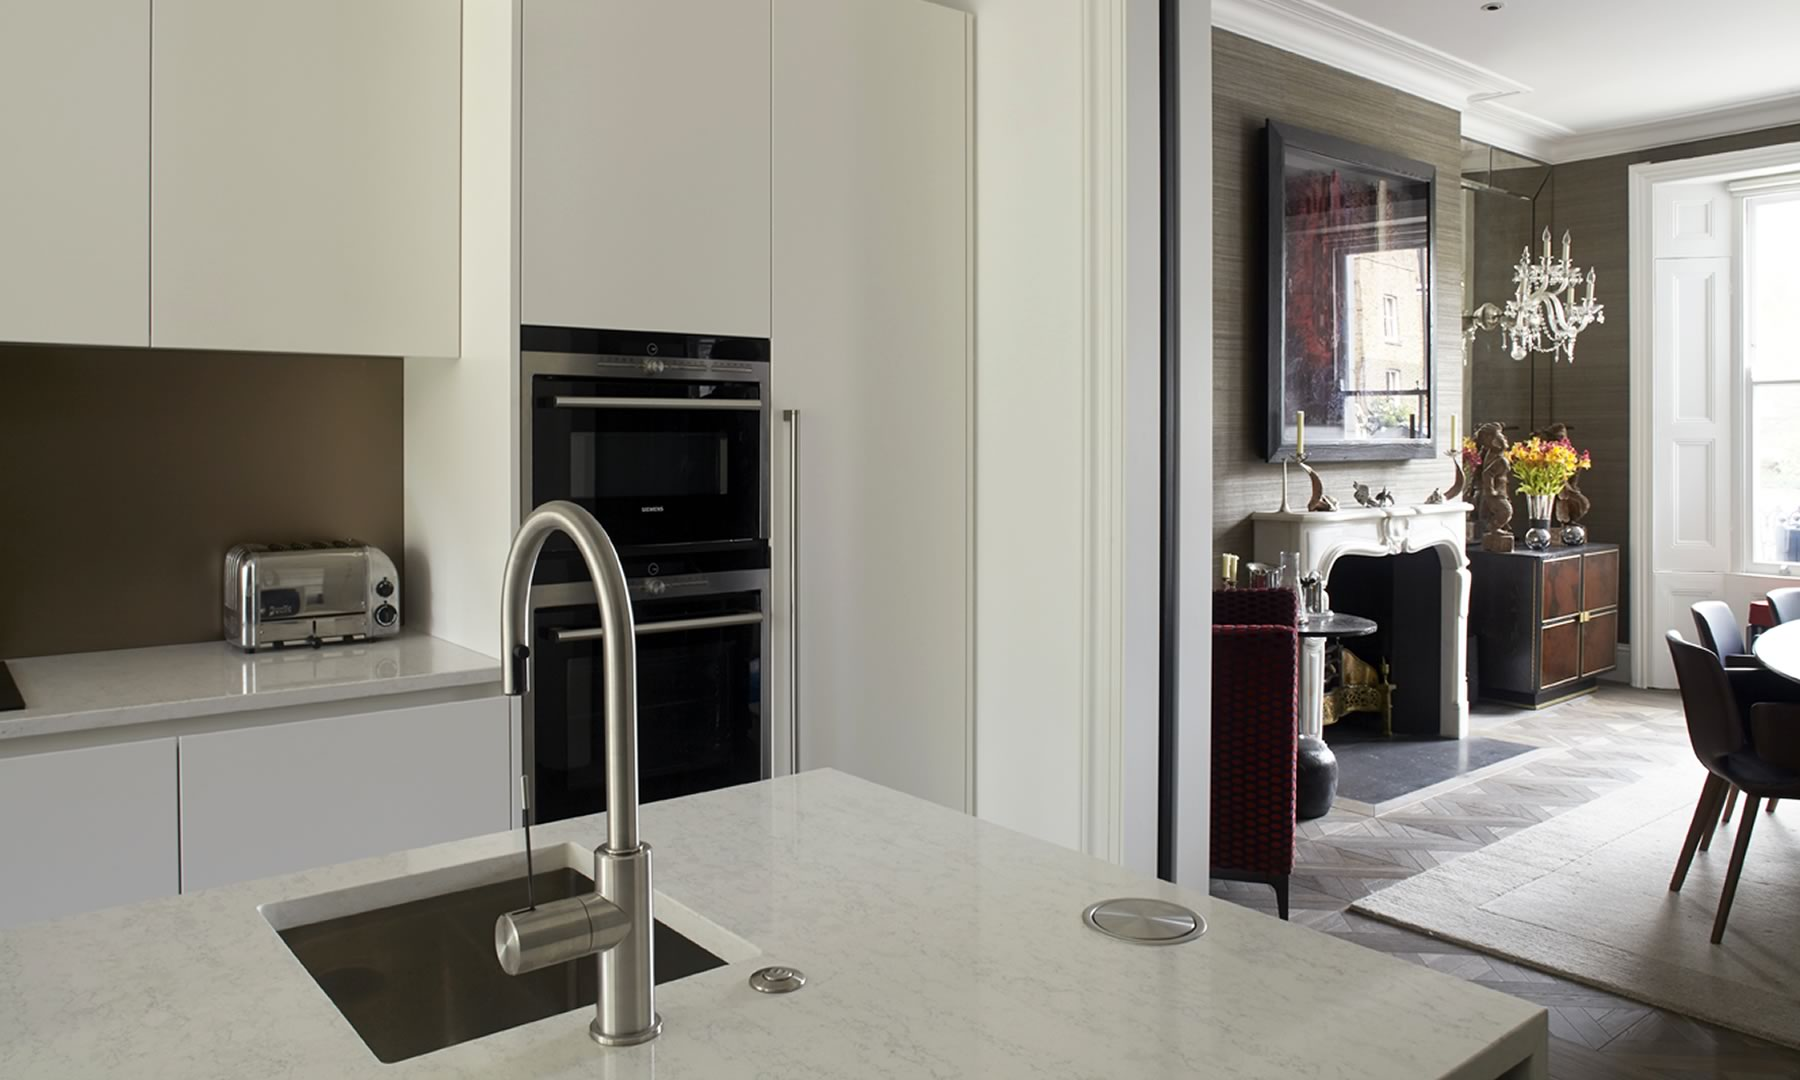 Kensington Kitchen View 1